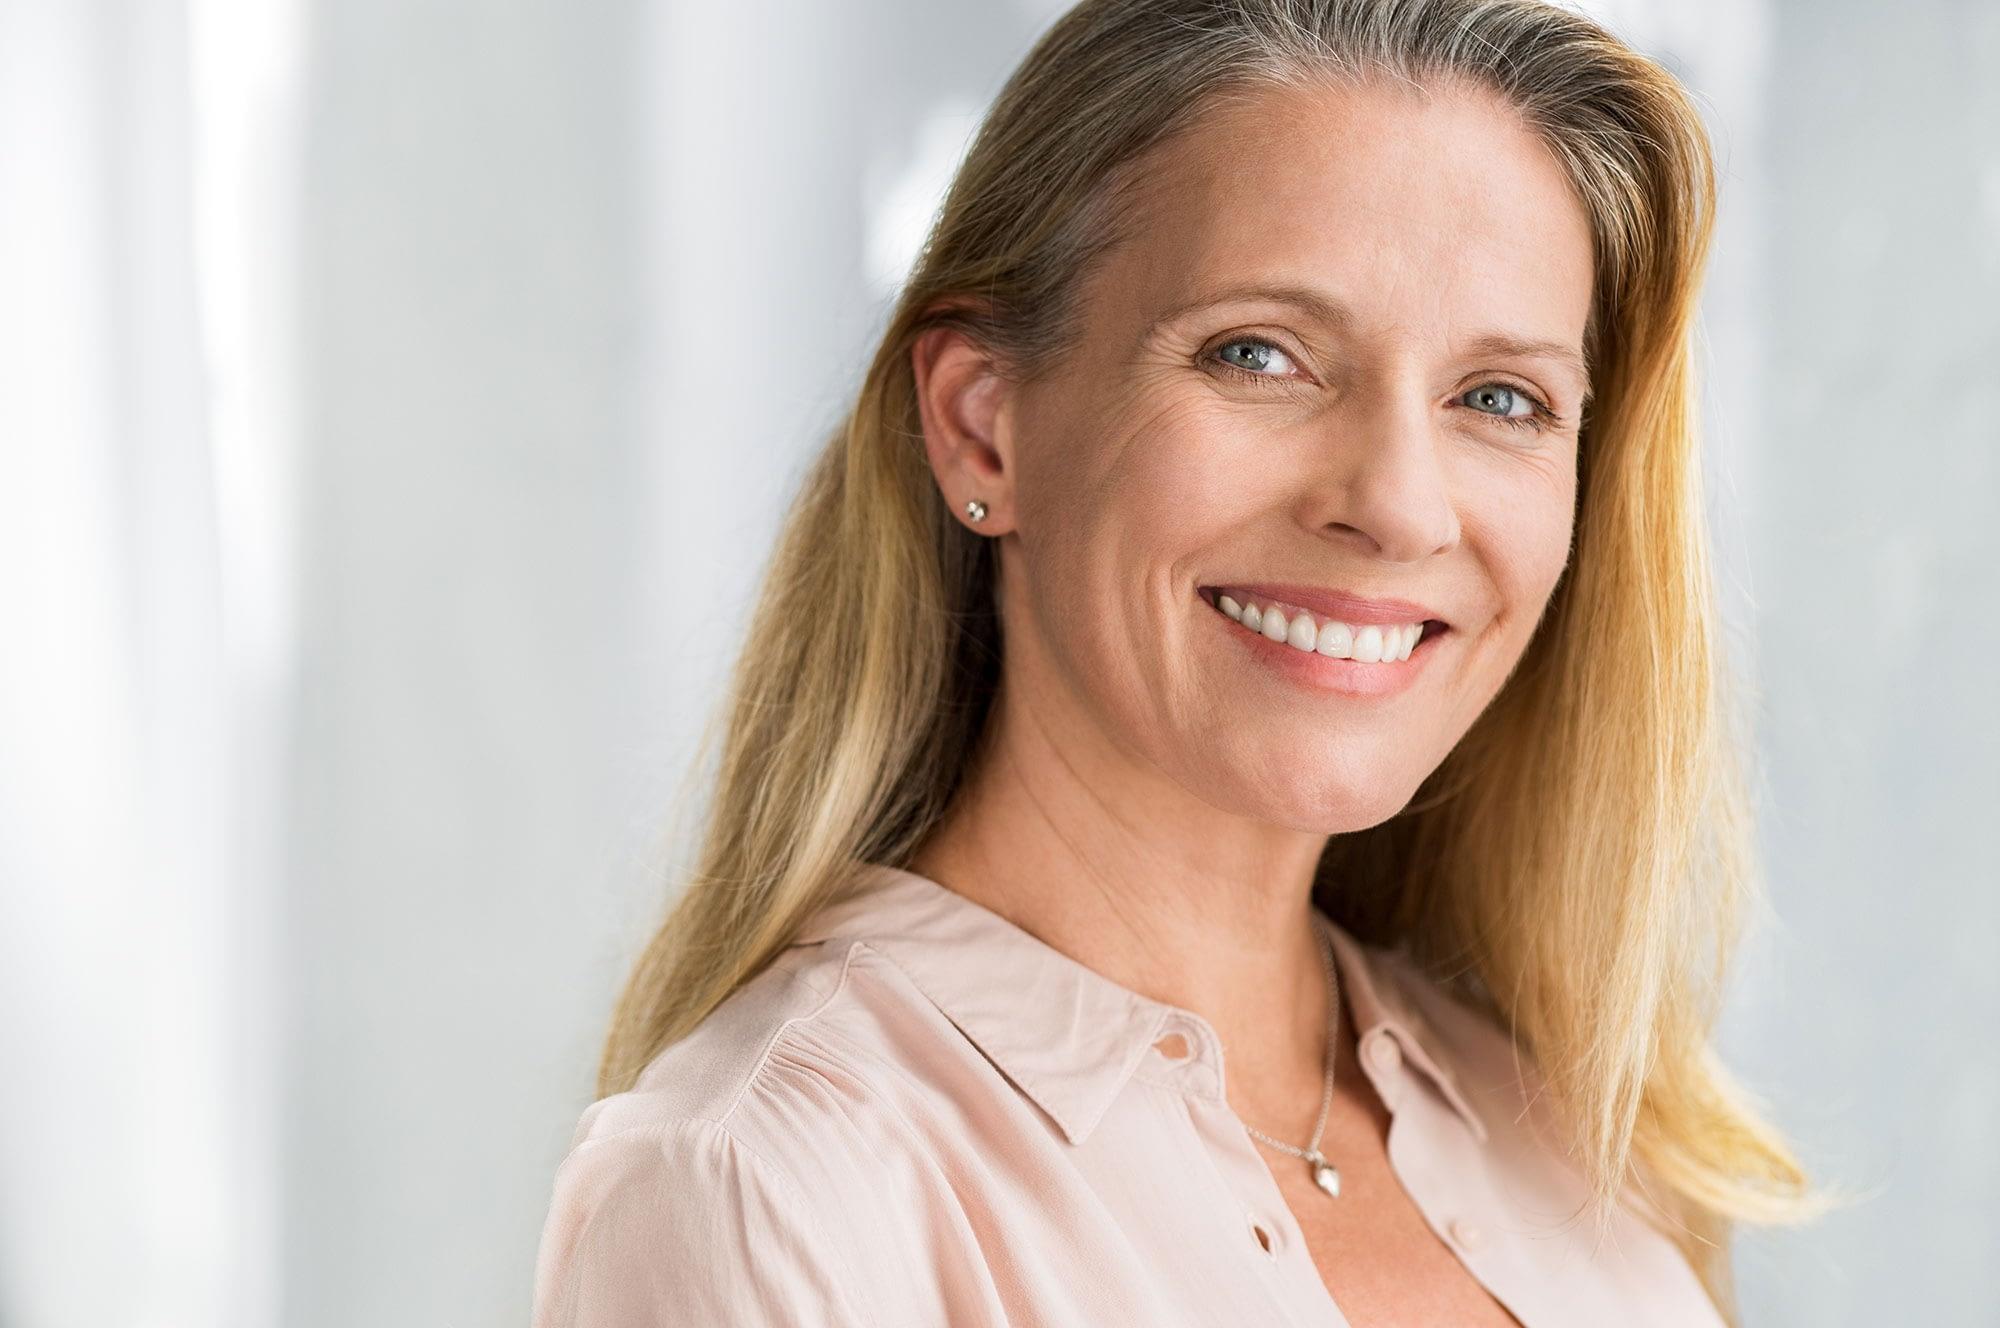 Dental Implant Patient Smiles